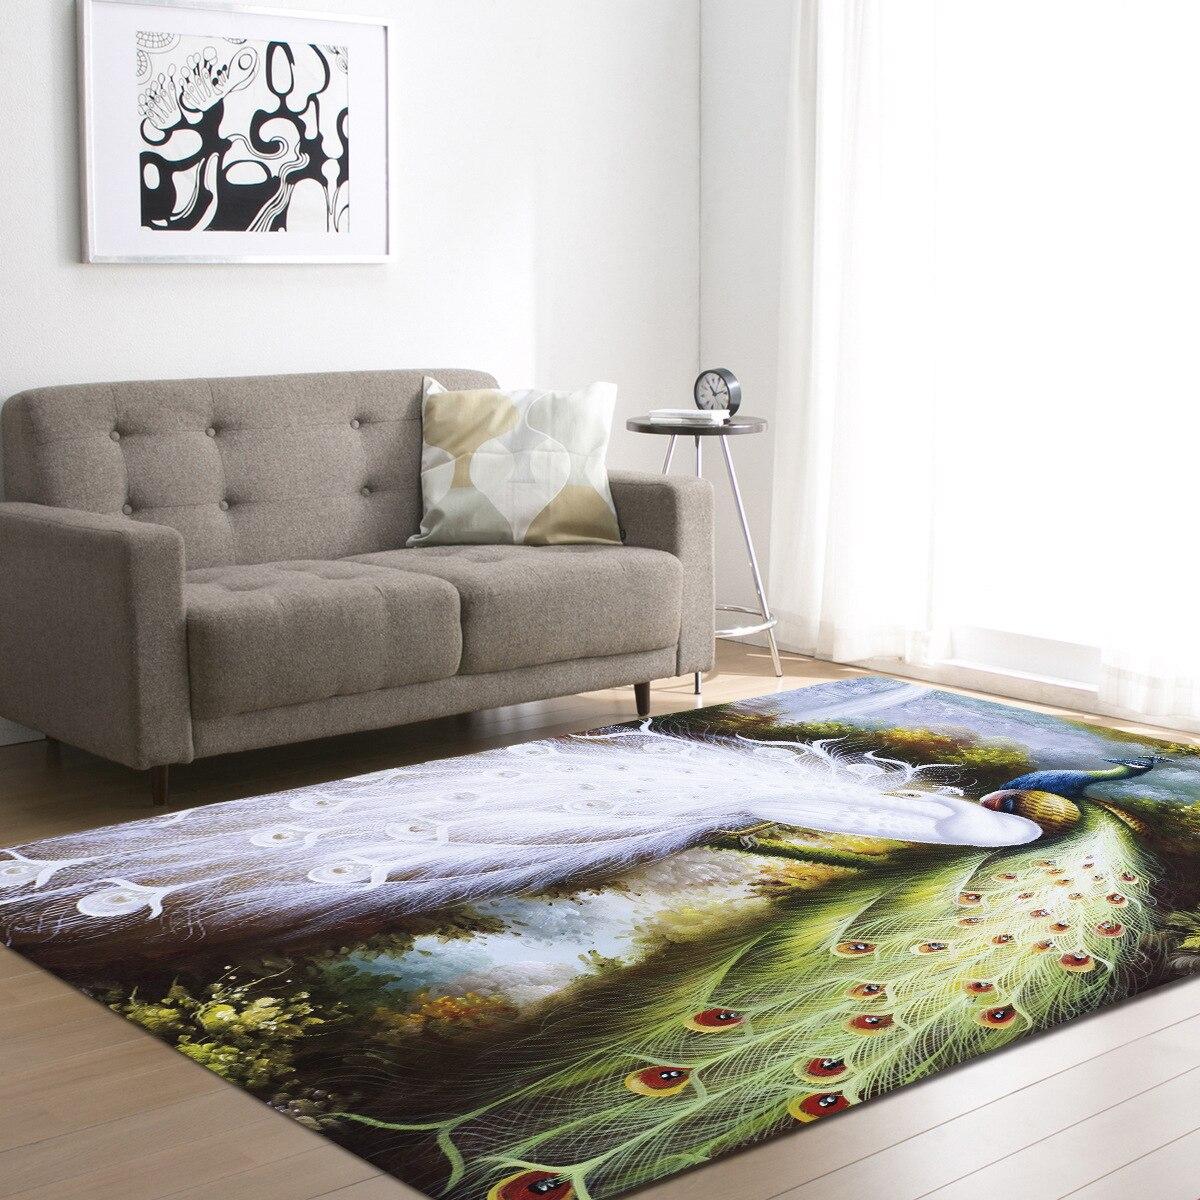 8 styles demissir 3d peacock print living room carpet kids bedroom rug alfombra tapete para sala. Black Bedroom Furniture Sets. Home Design Ideas